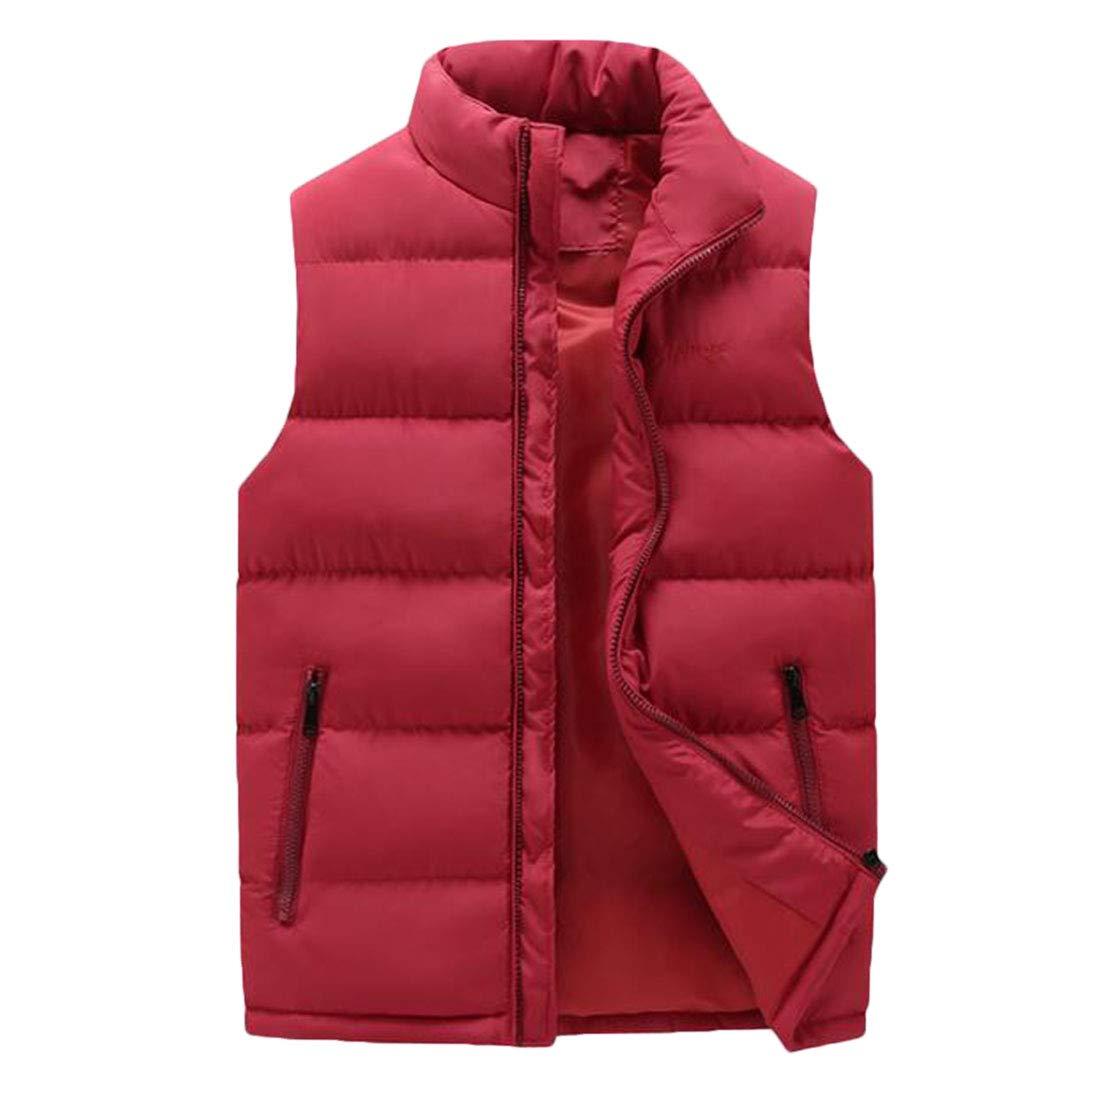 Ueioc Men Winter Stand Collar Quilted Sleeveless Puffer Down Vest